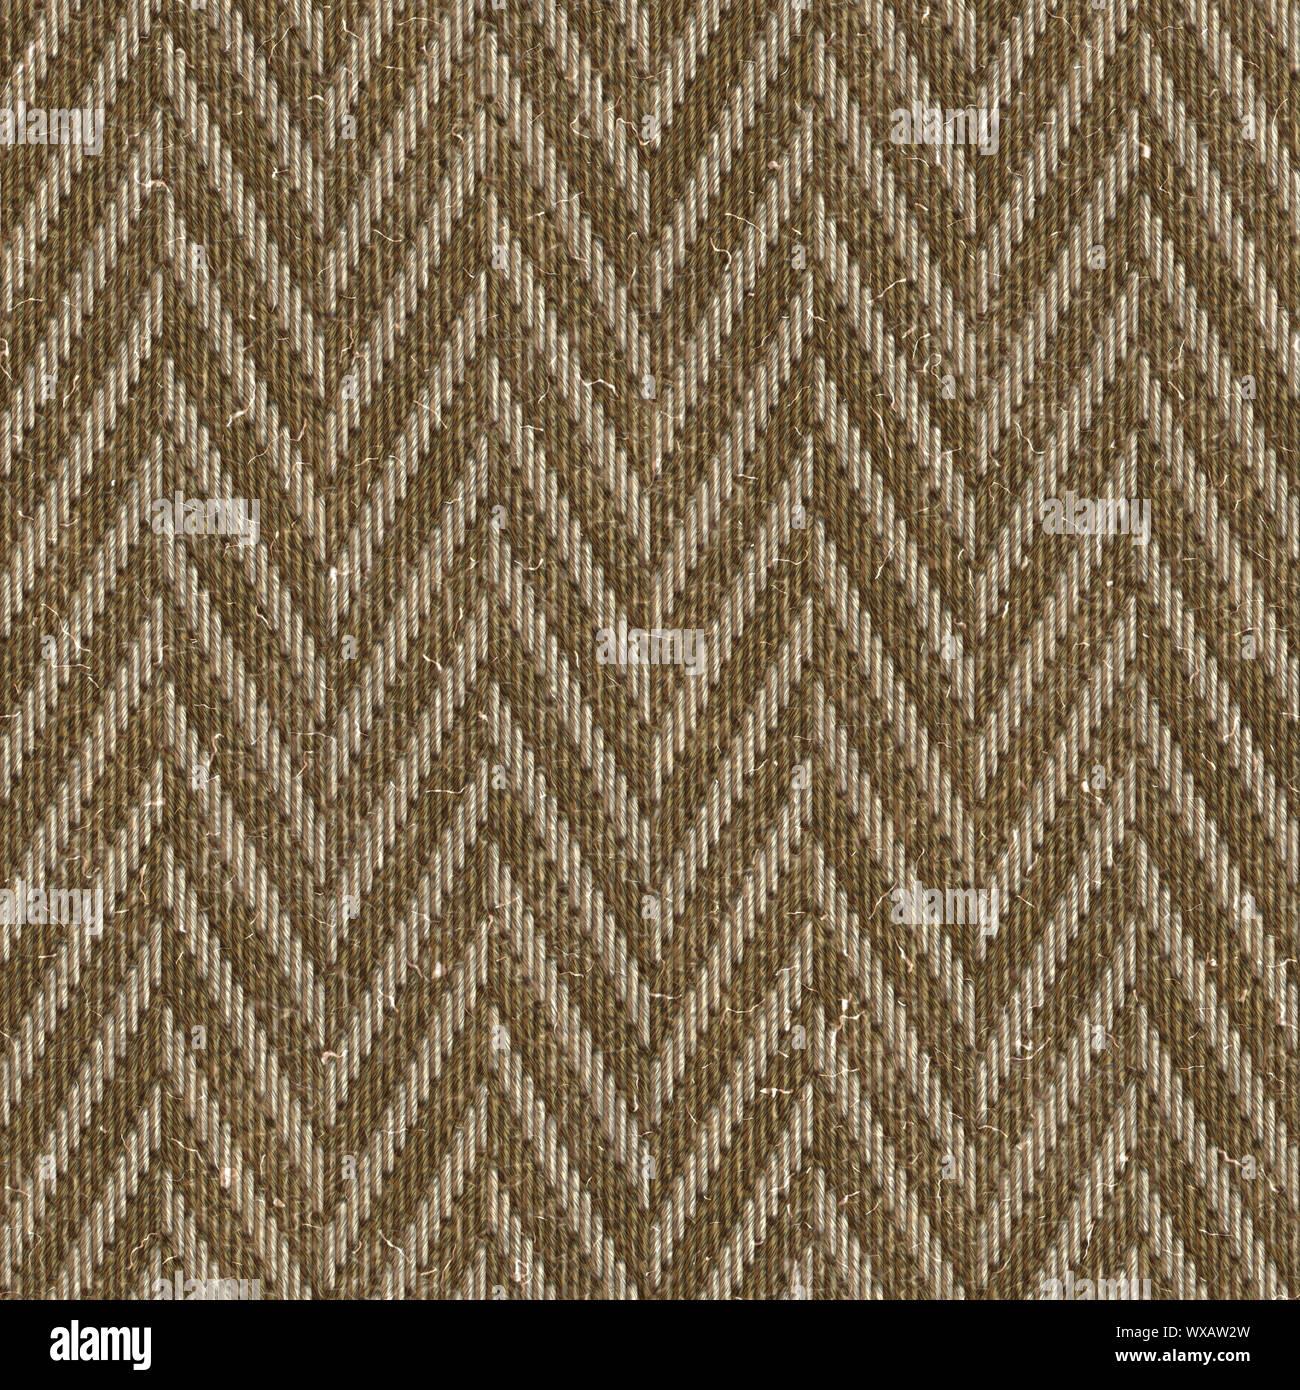 Seamless Tweed Fabric Texture Stock Photo Alamy